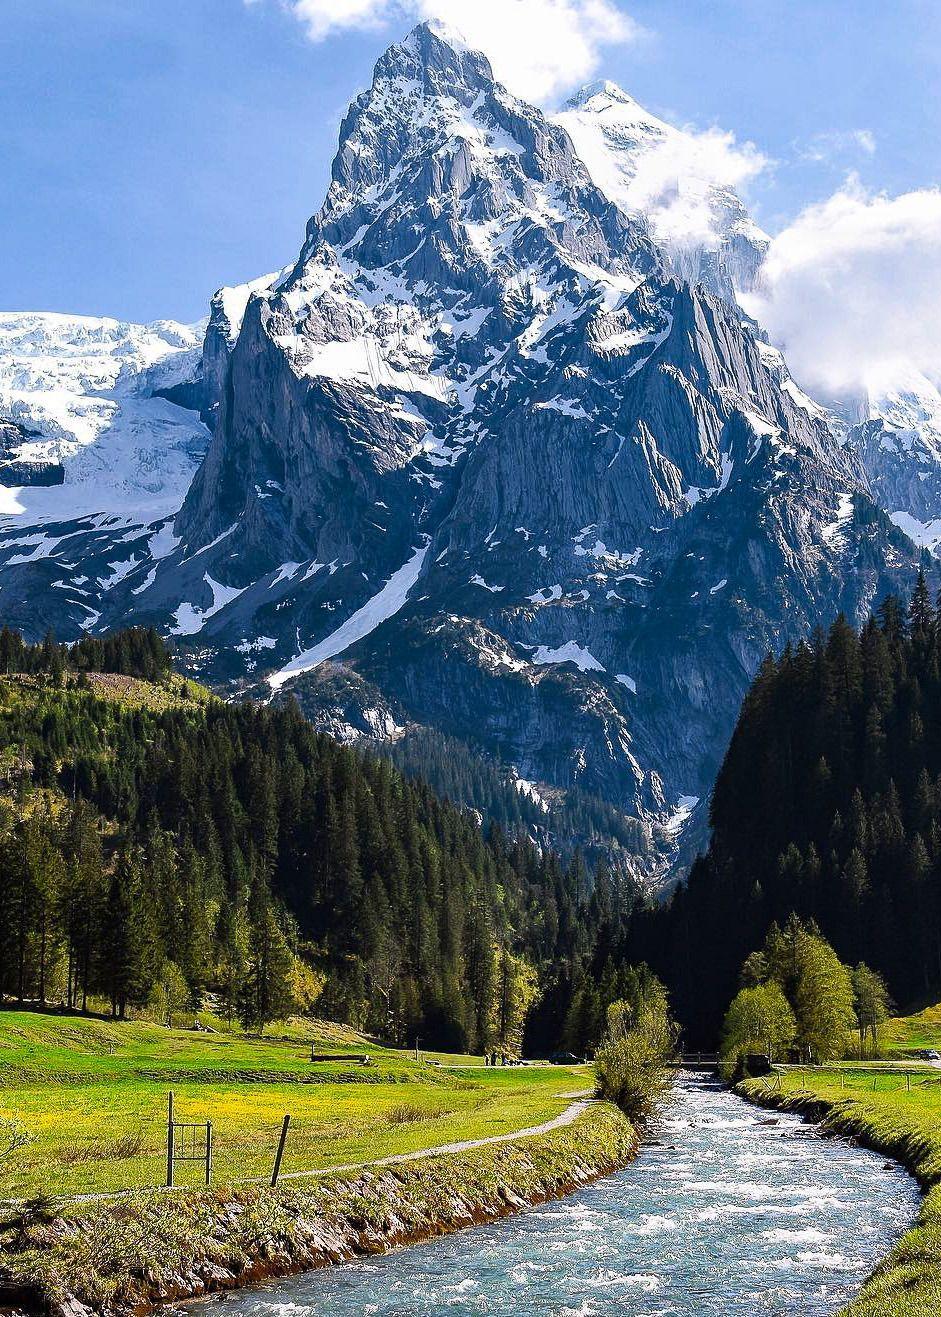 Berner Oberland Switzerland Berner Oberland Switzerland Nature Landscape Mountains Beautiful Landscapes Nature Photography Wonders Of The World